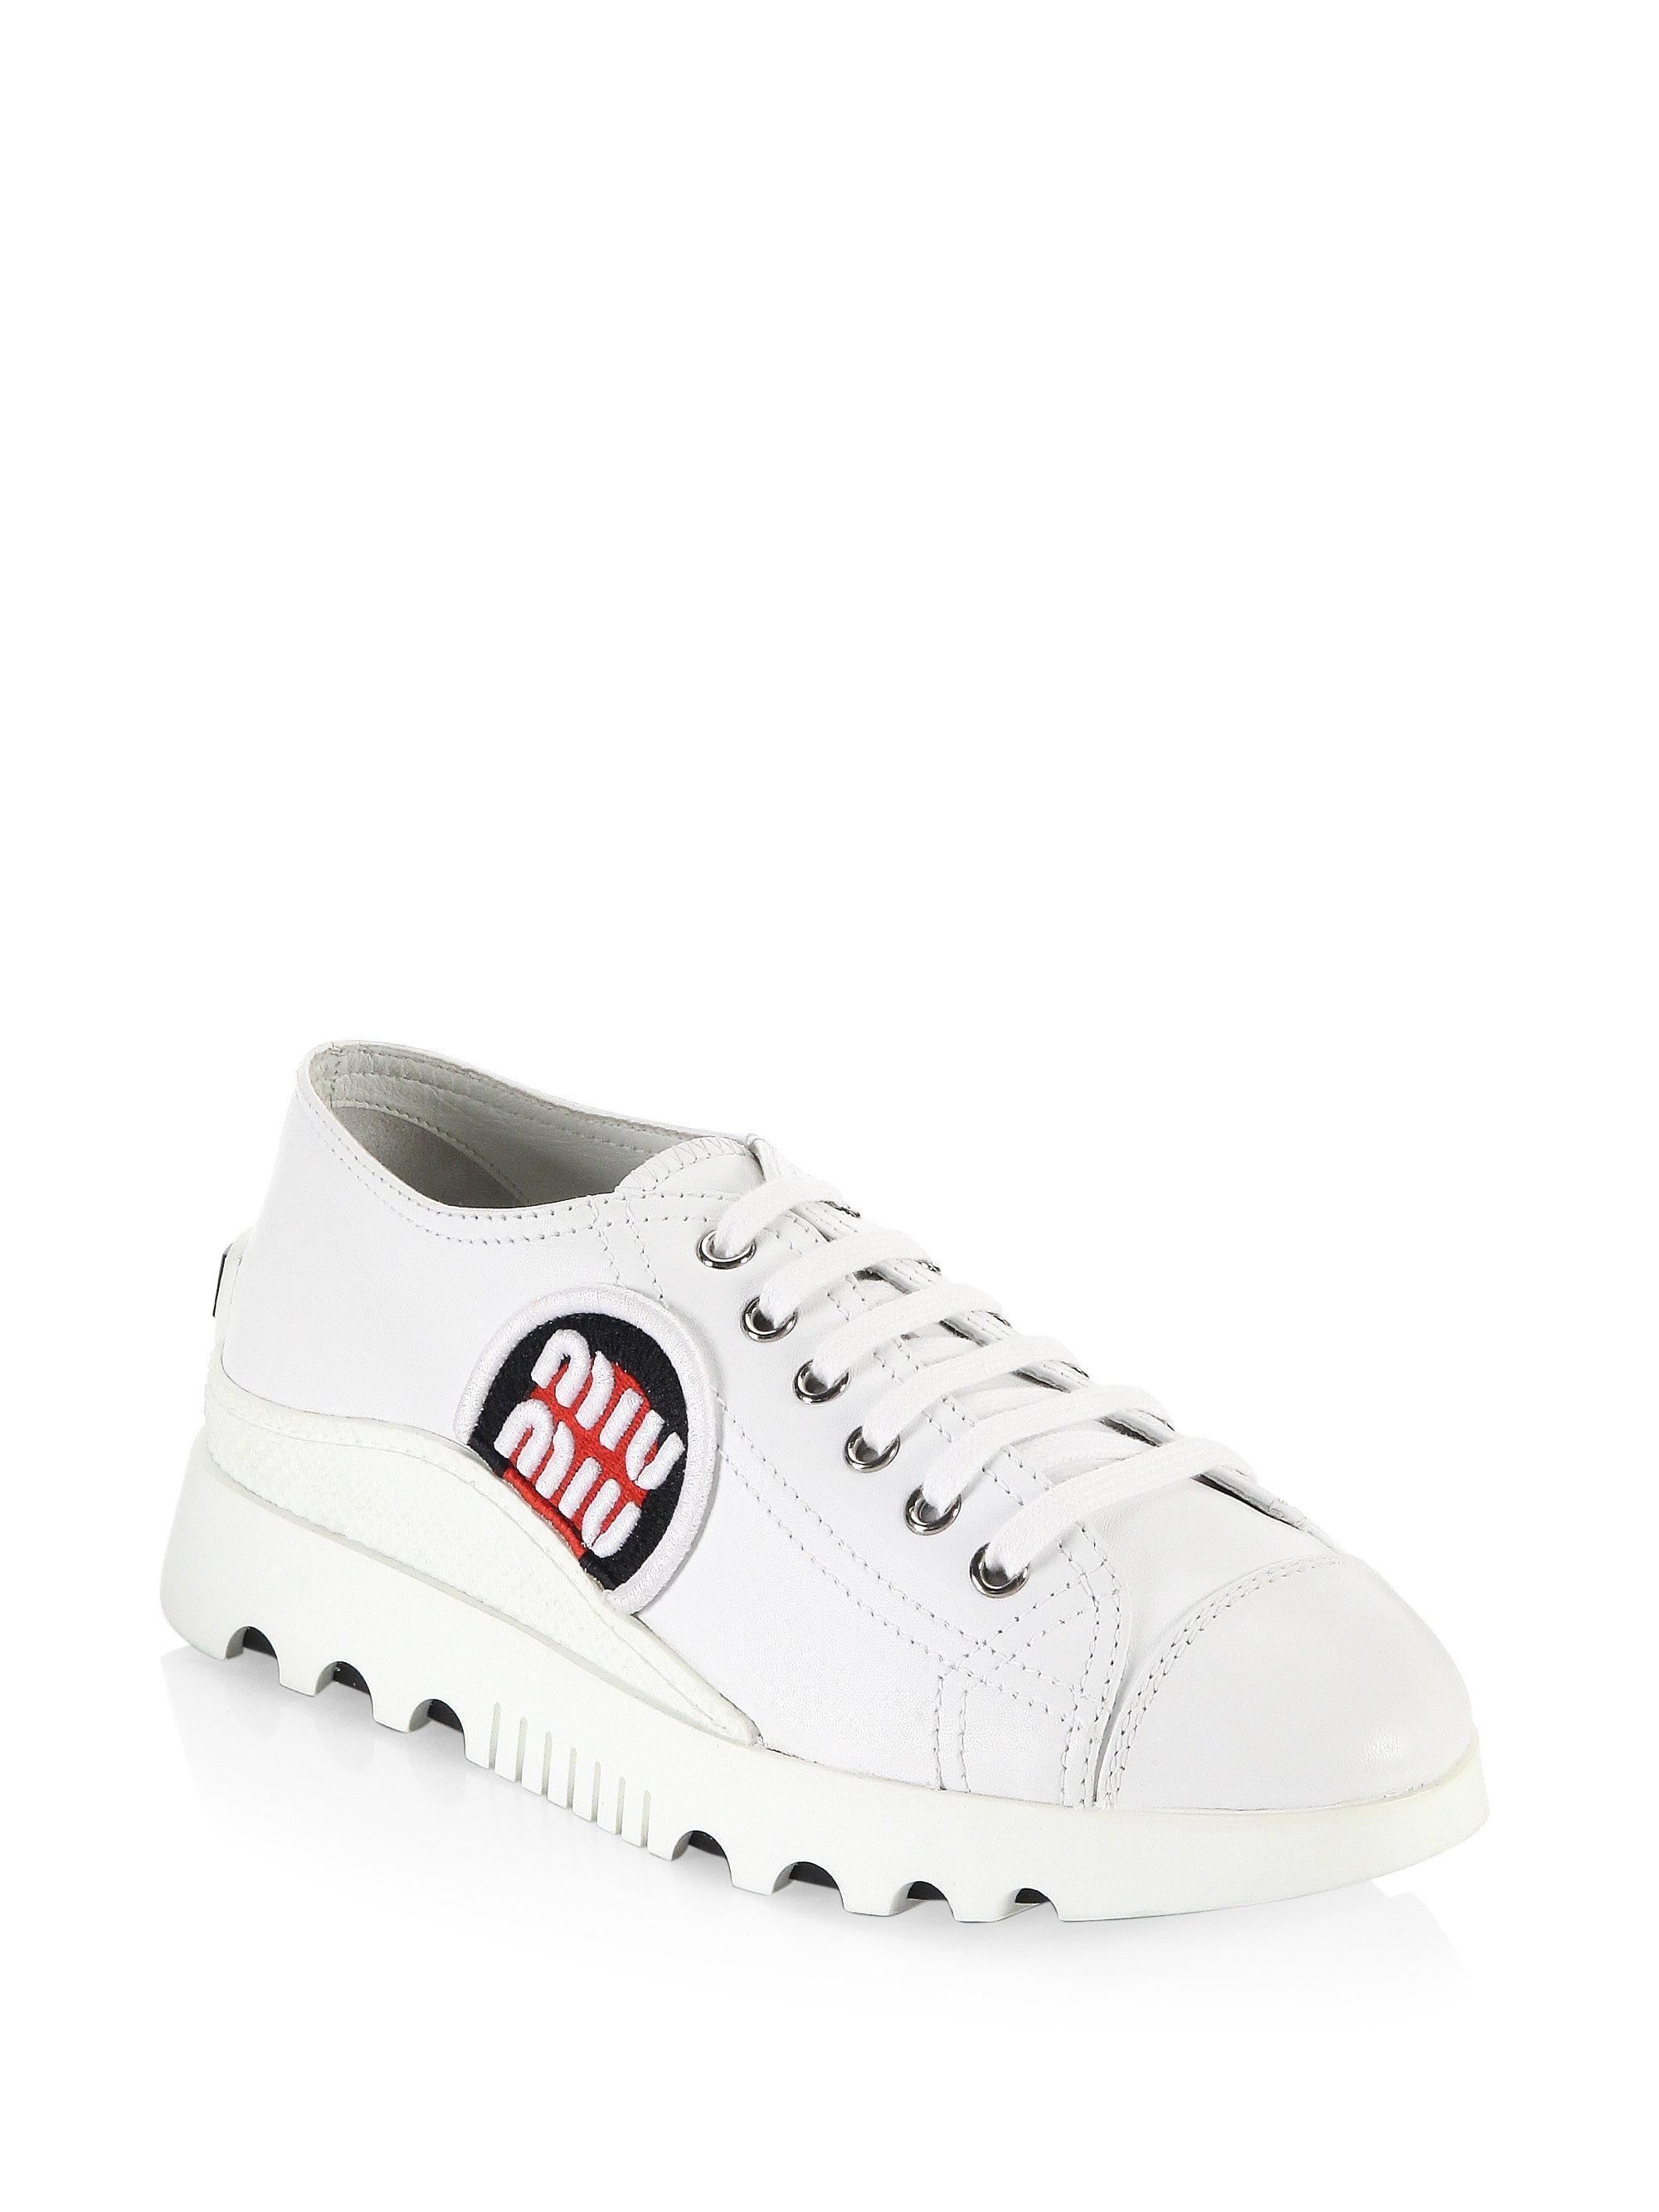 Miu Miu Patch Leather Sneakers O6EnDO7U0t